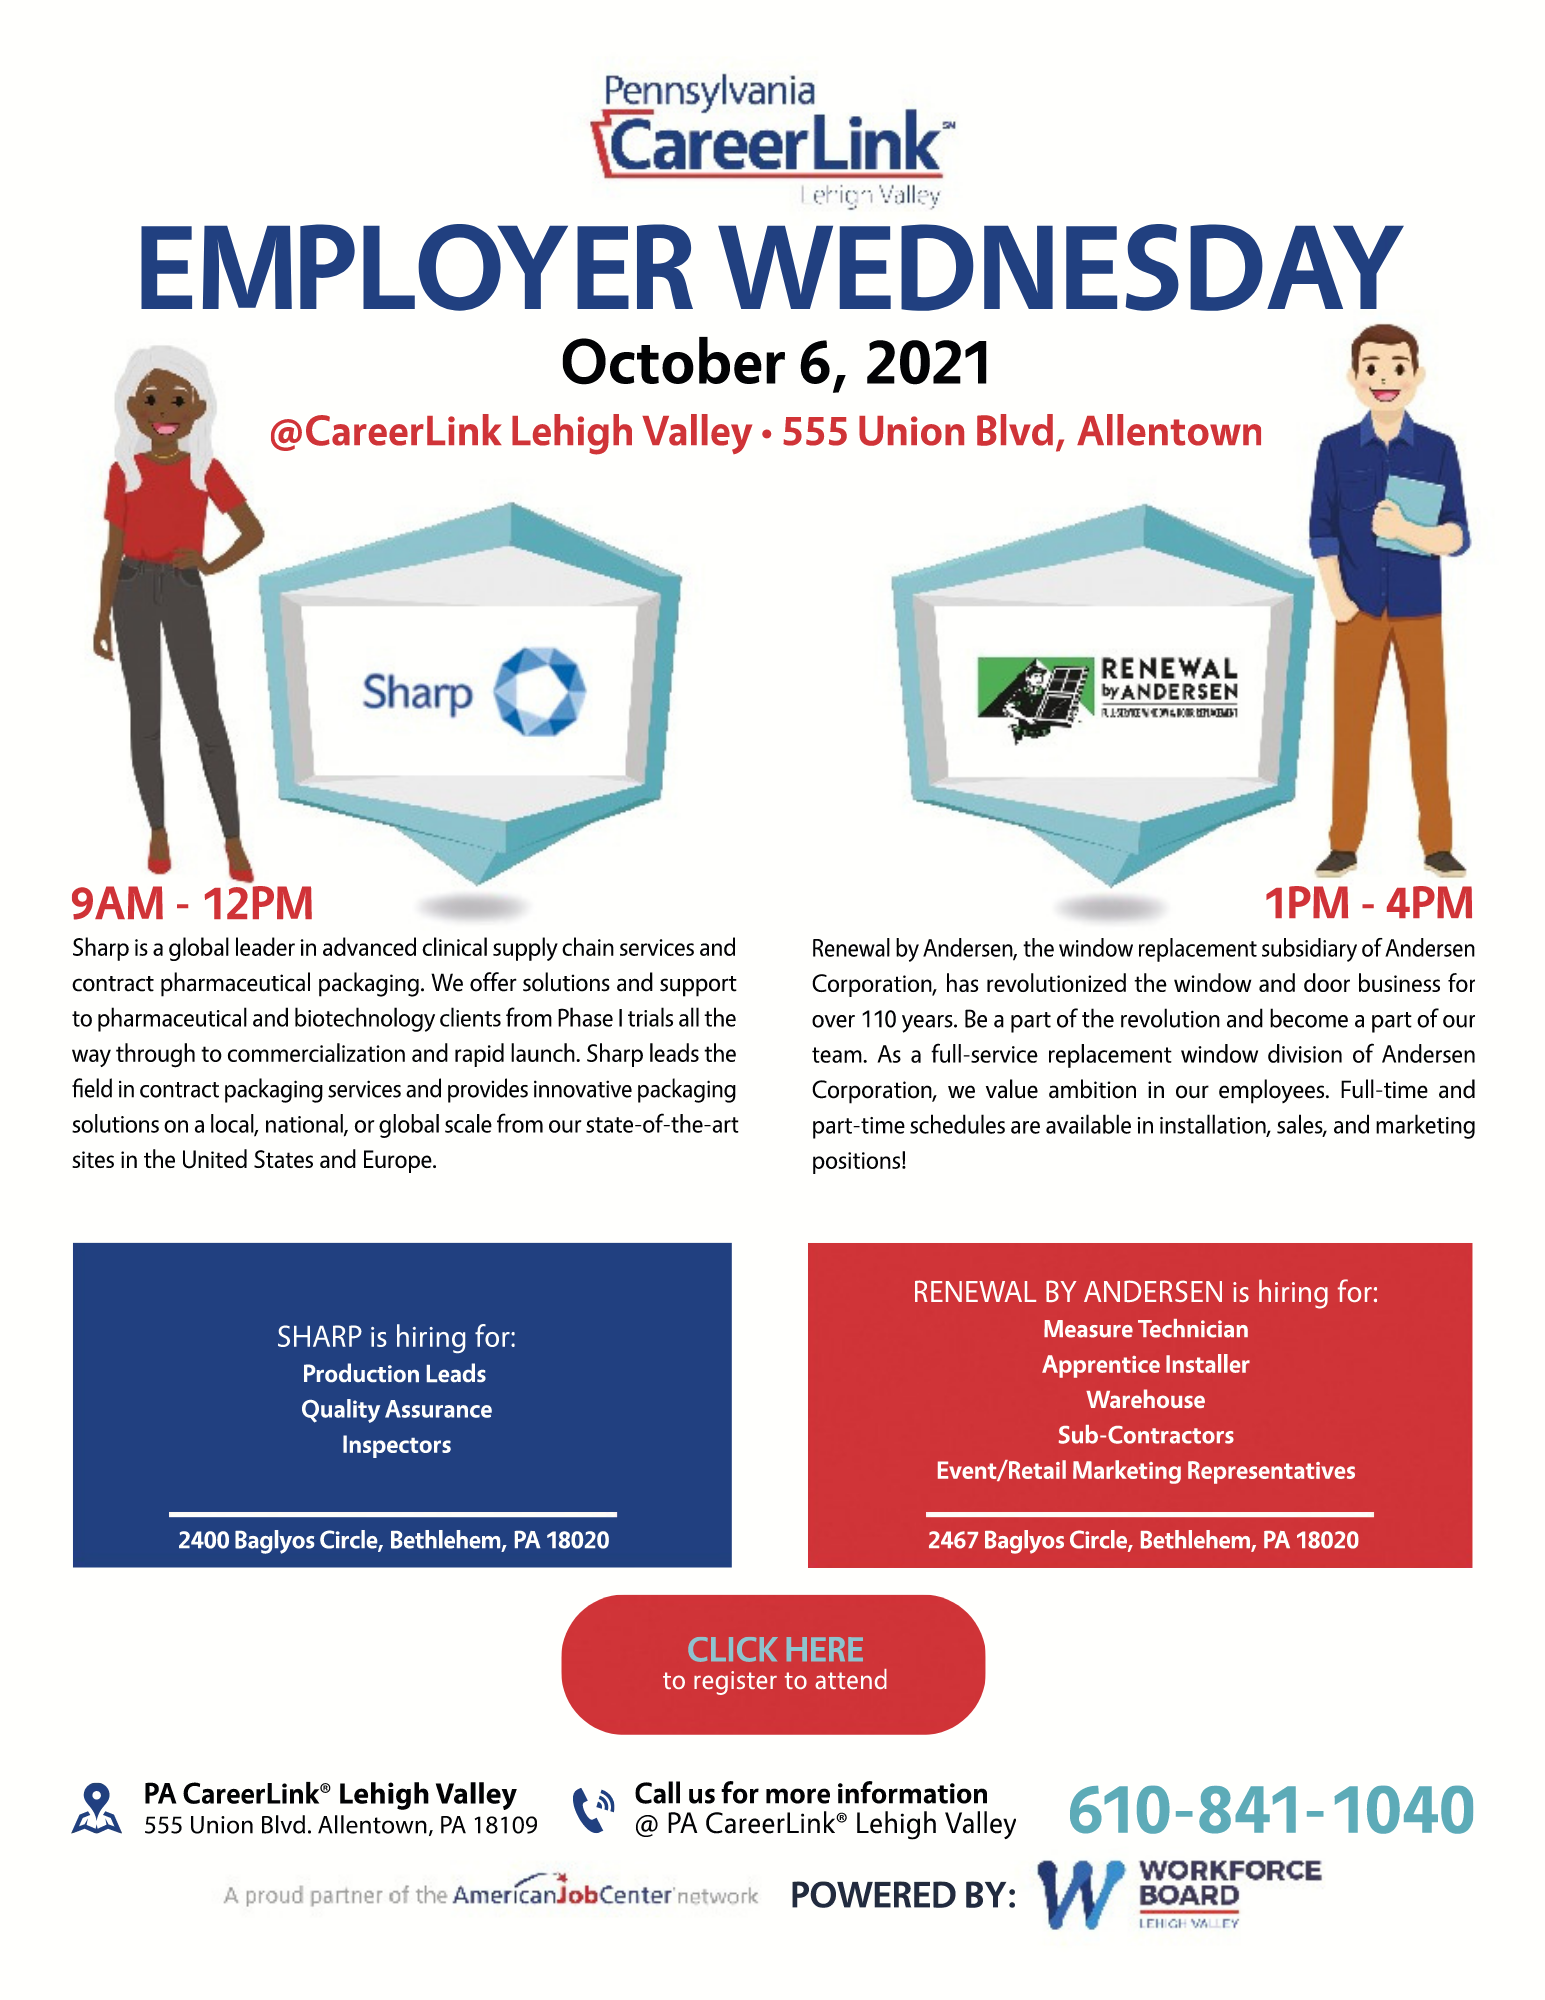 October 6 Employer Wednesday flyer